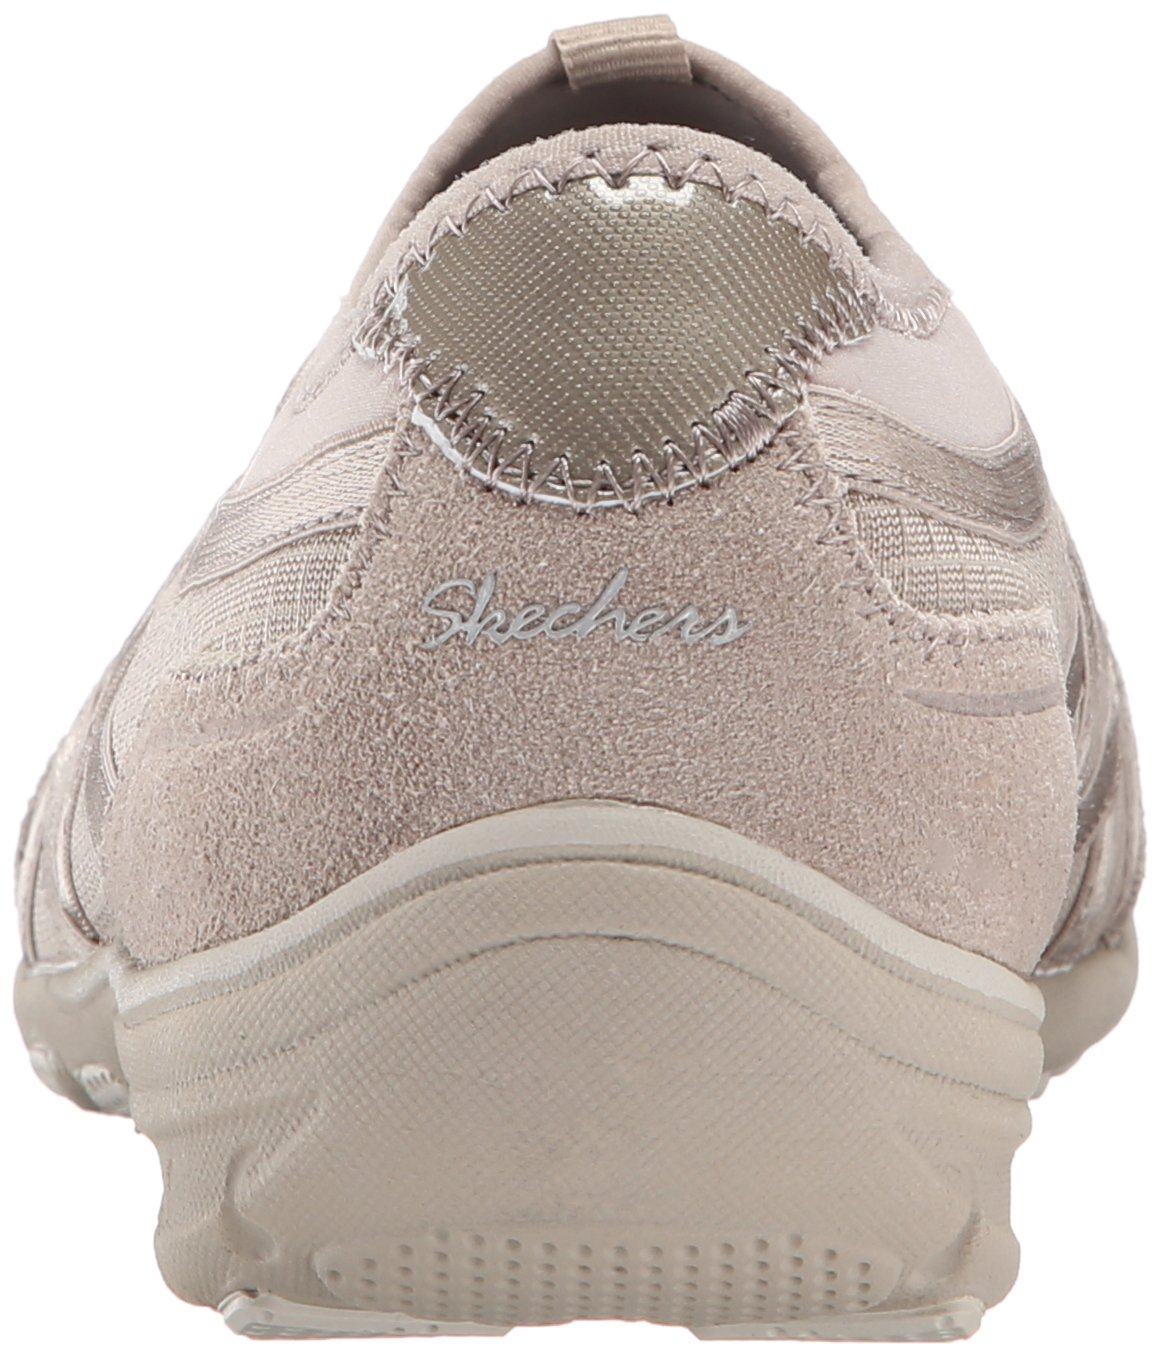 Skechers Sport Women's Conversations Charming Fashion Sneaker B00TGXIUBS 6.5 B(M) US|Taupe